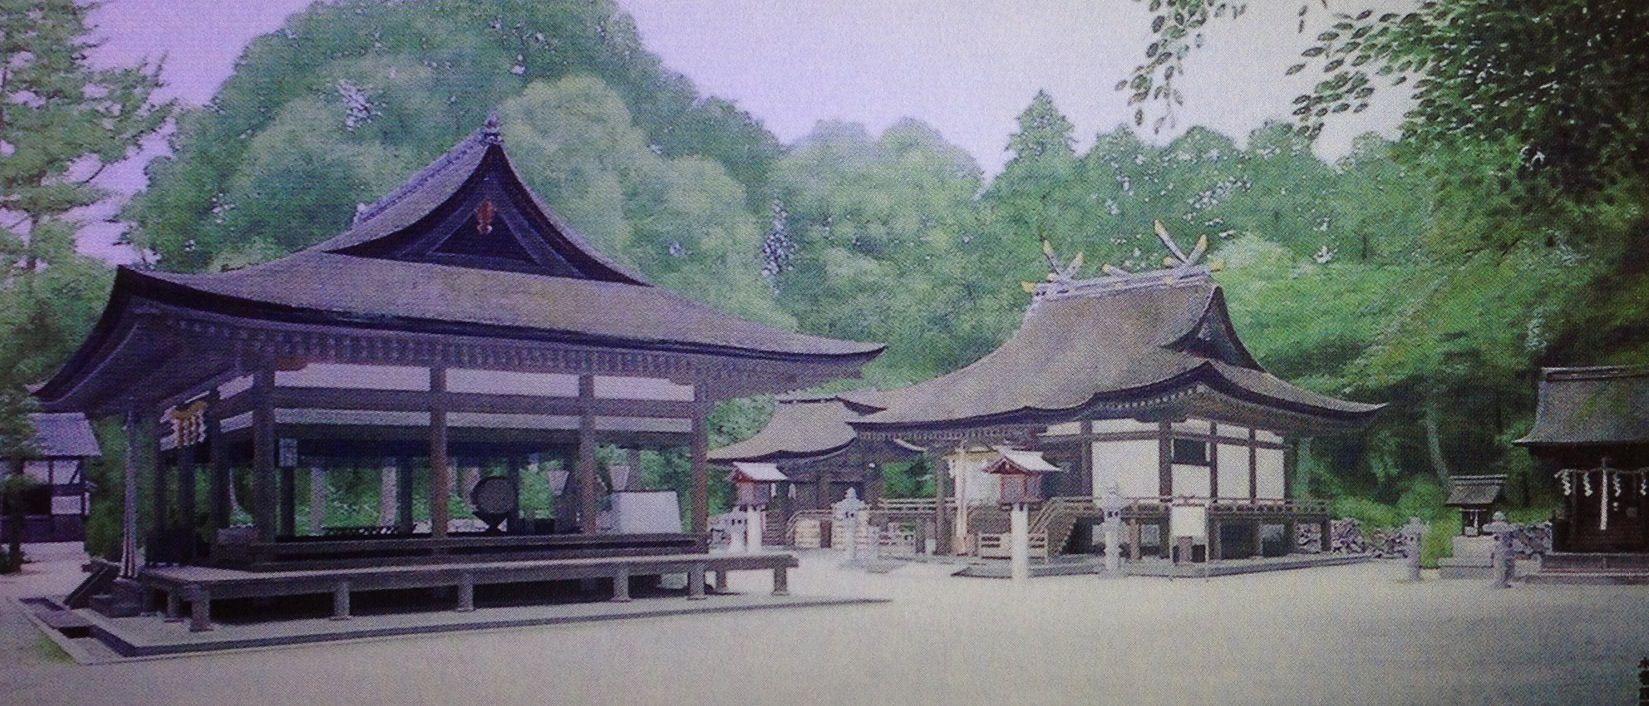 Suiun Yamada art